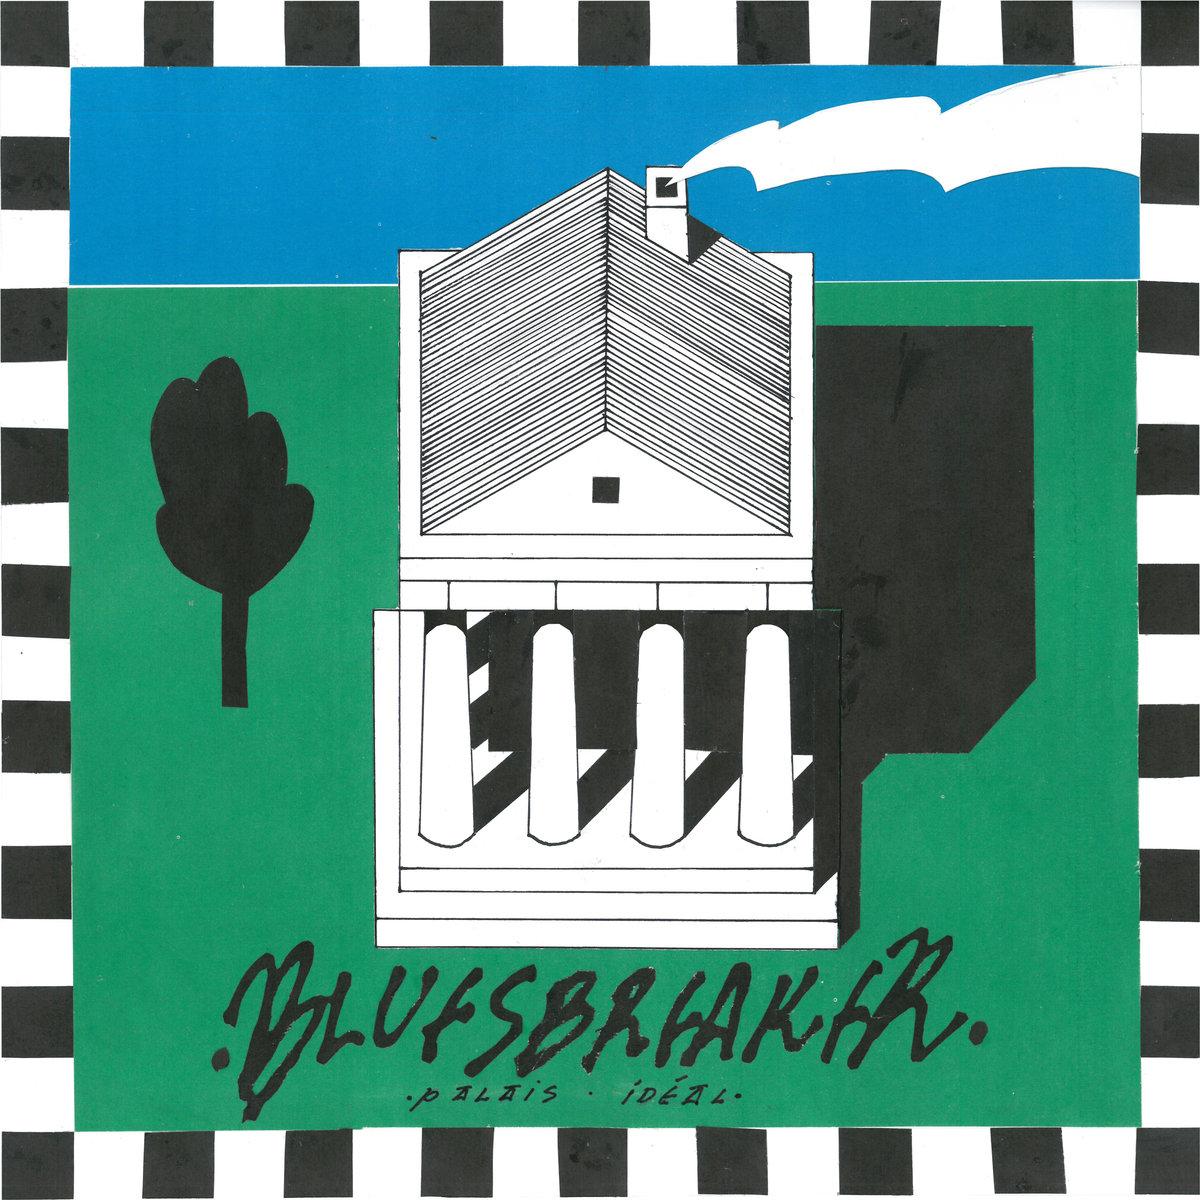 Bluesbreaker — Palais Ideal